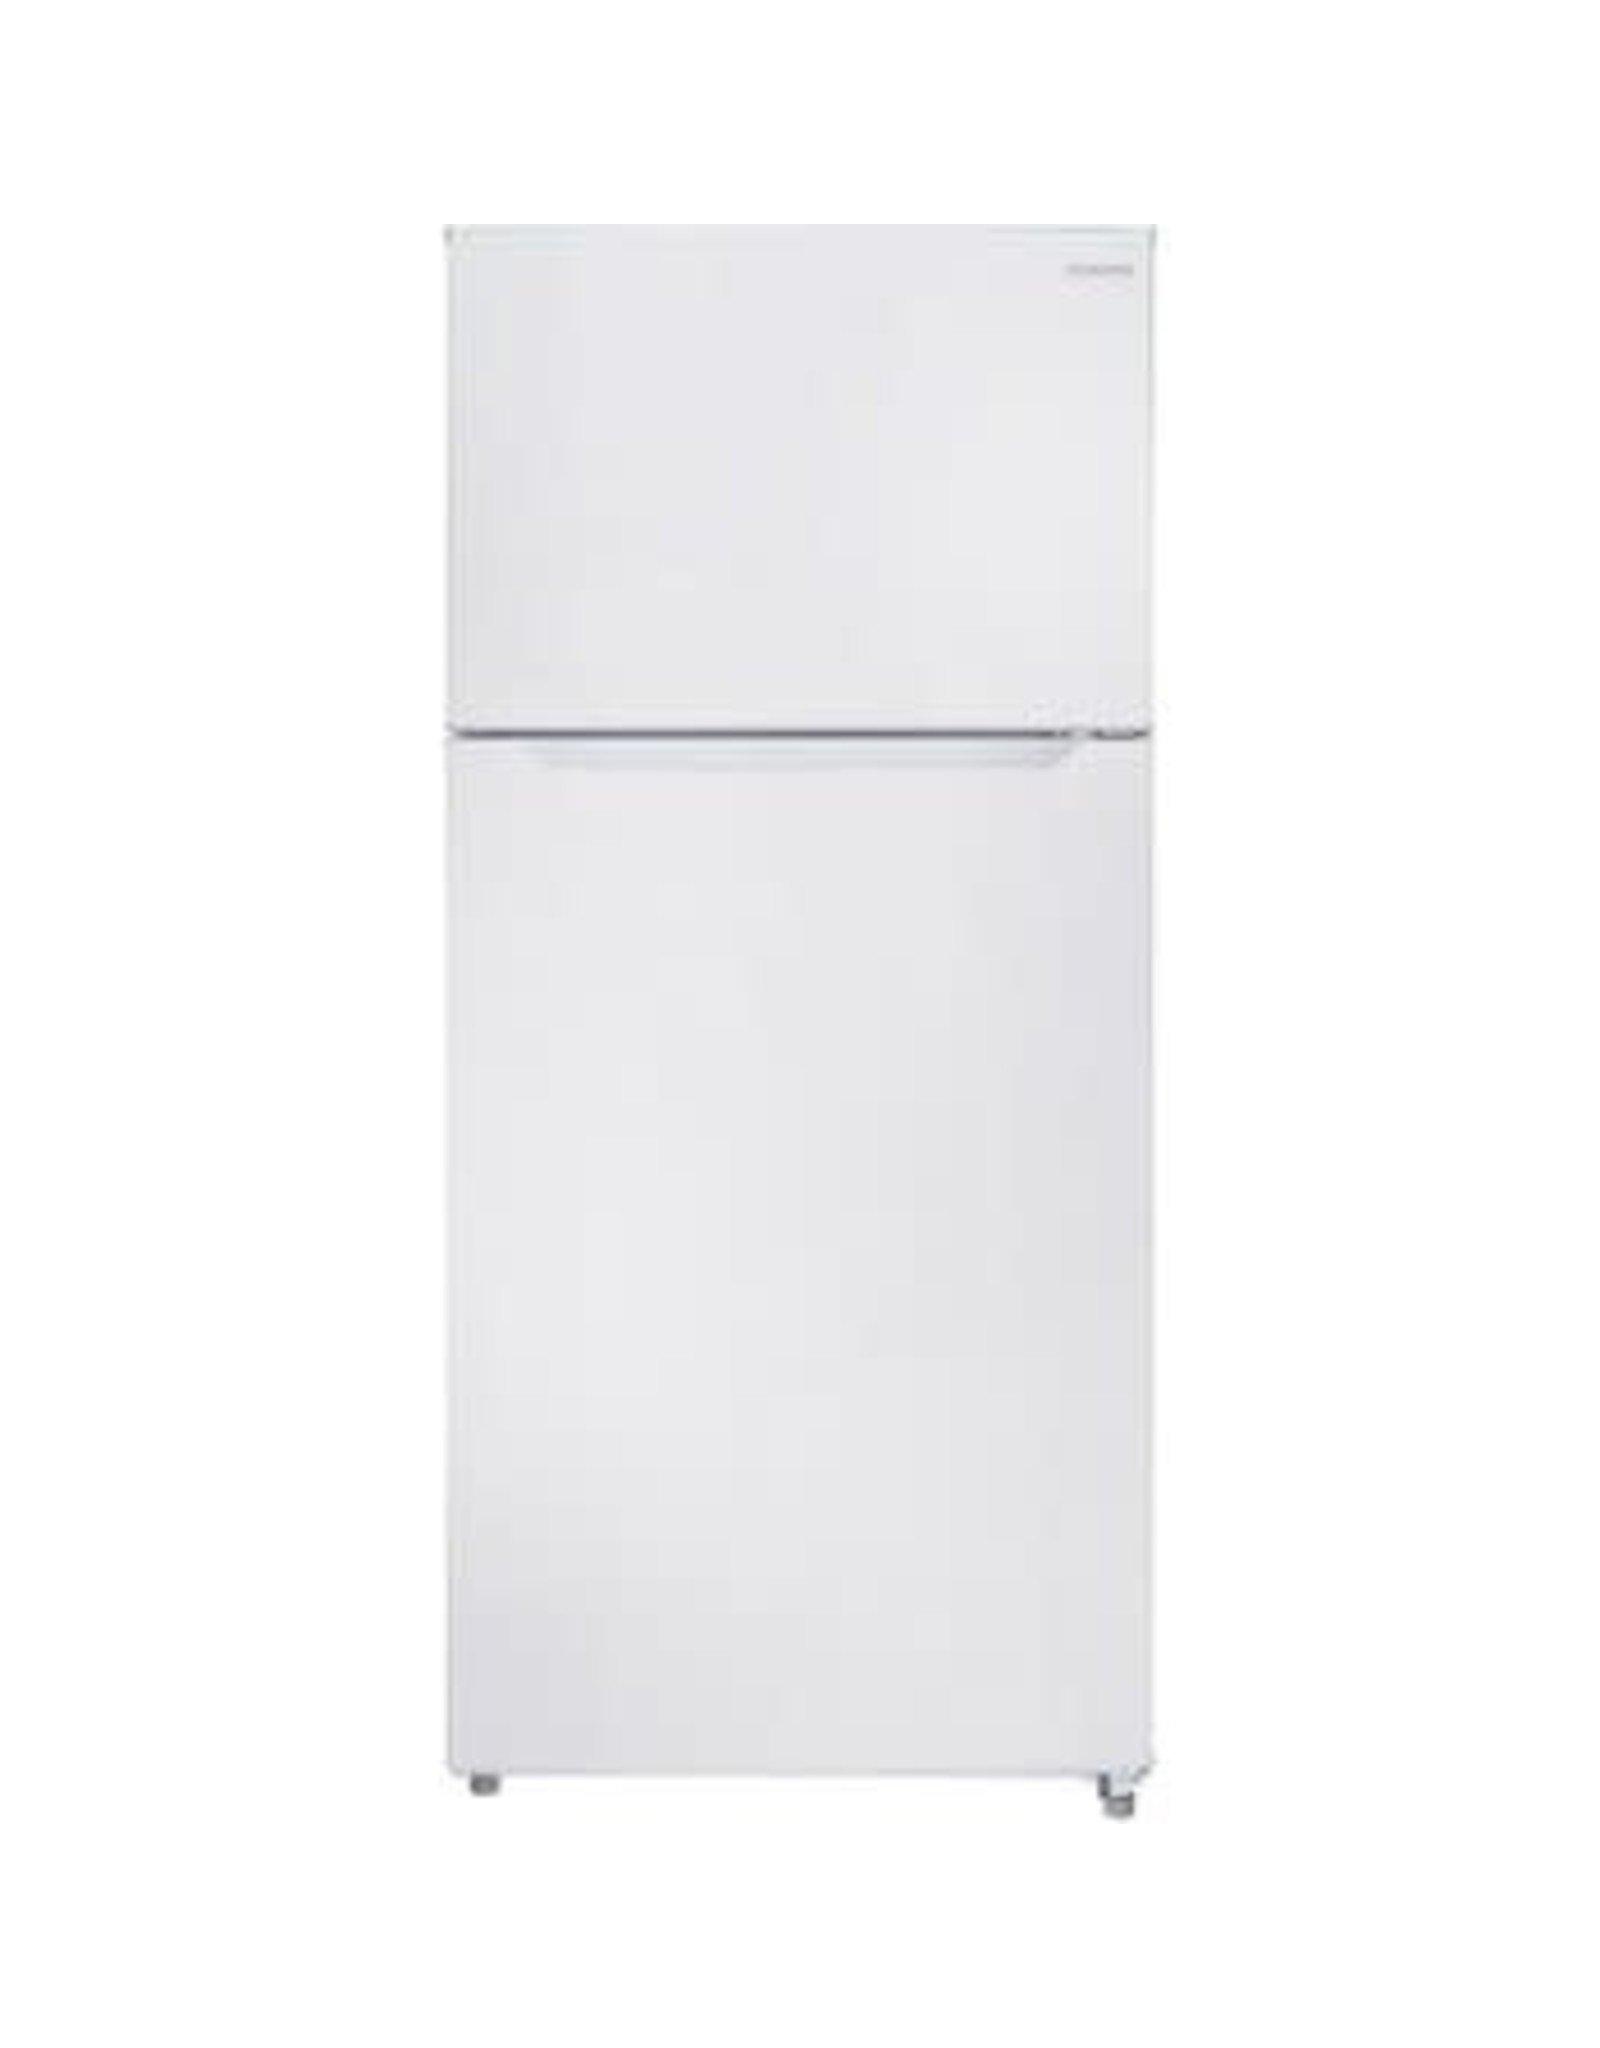 Insignia™ NS-RTM18WH7 Insignia™ - 18 Cu. Ft. Top-Freezer Refrigerator - White